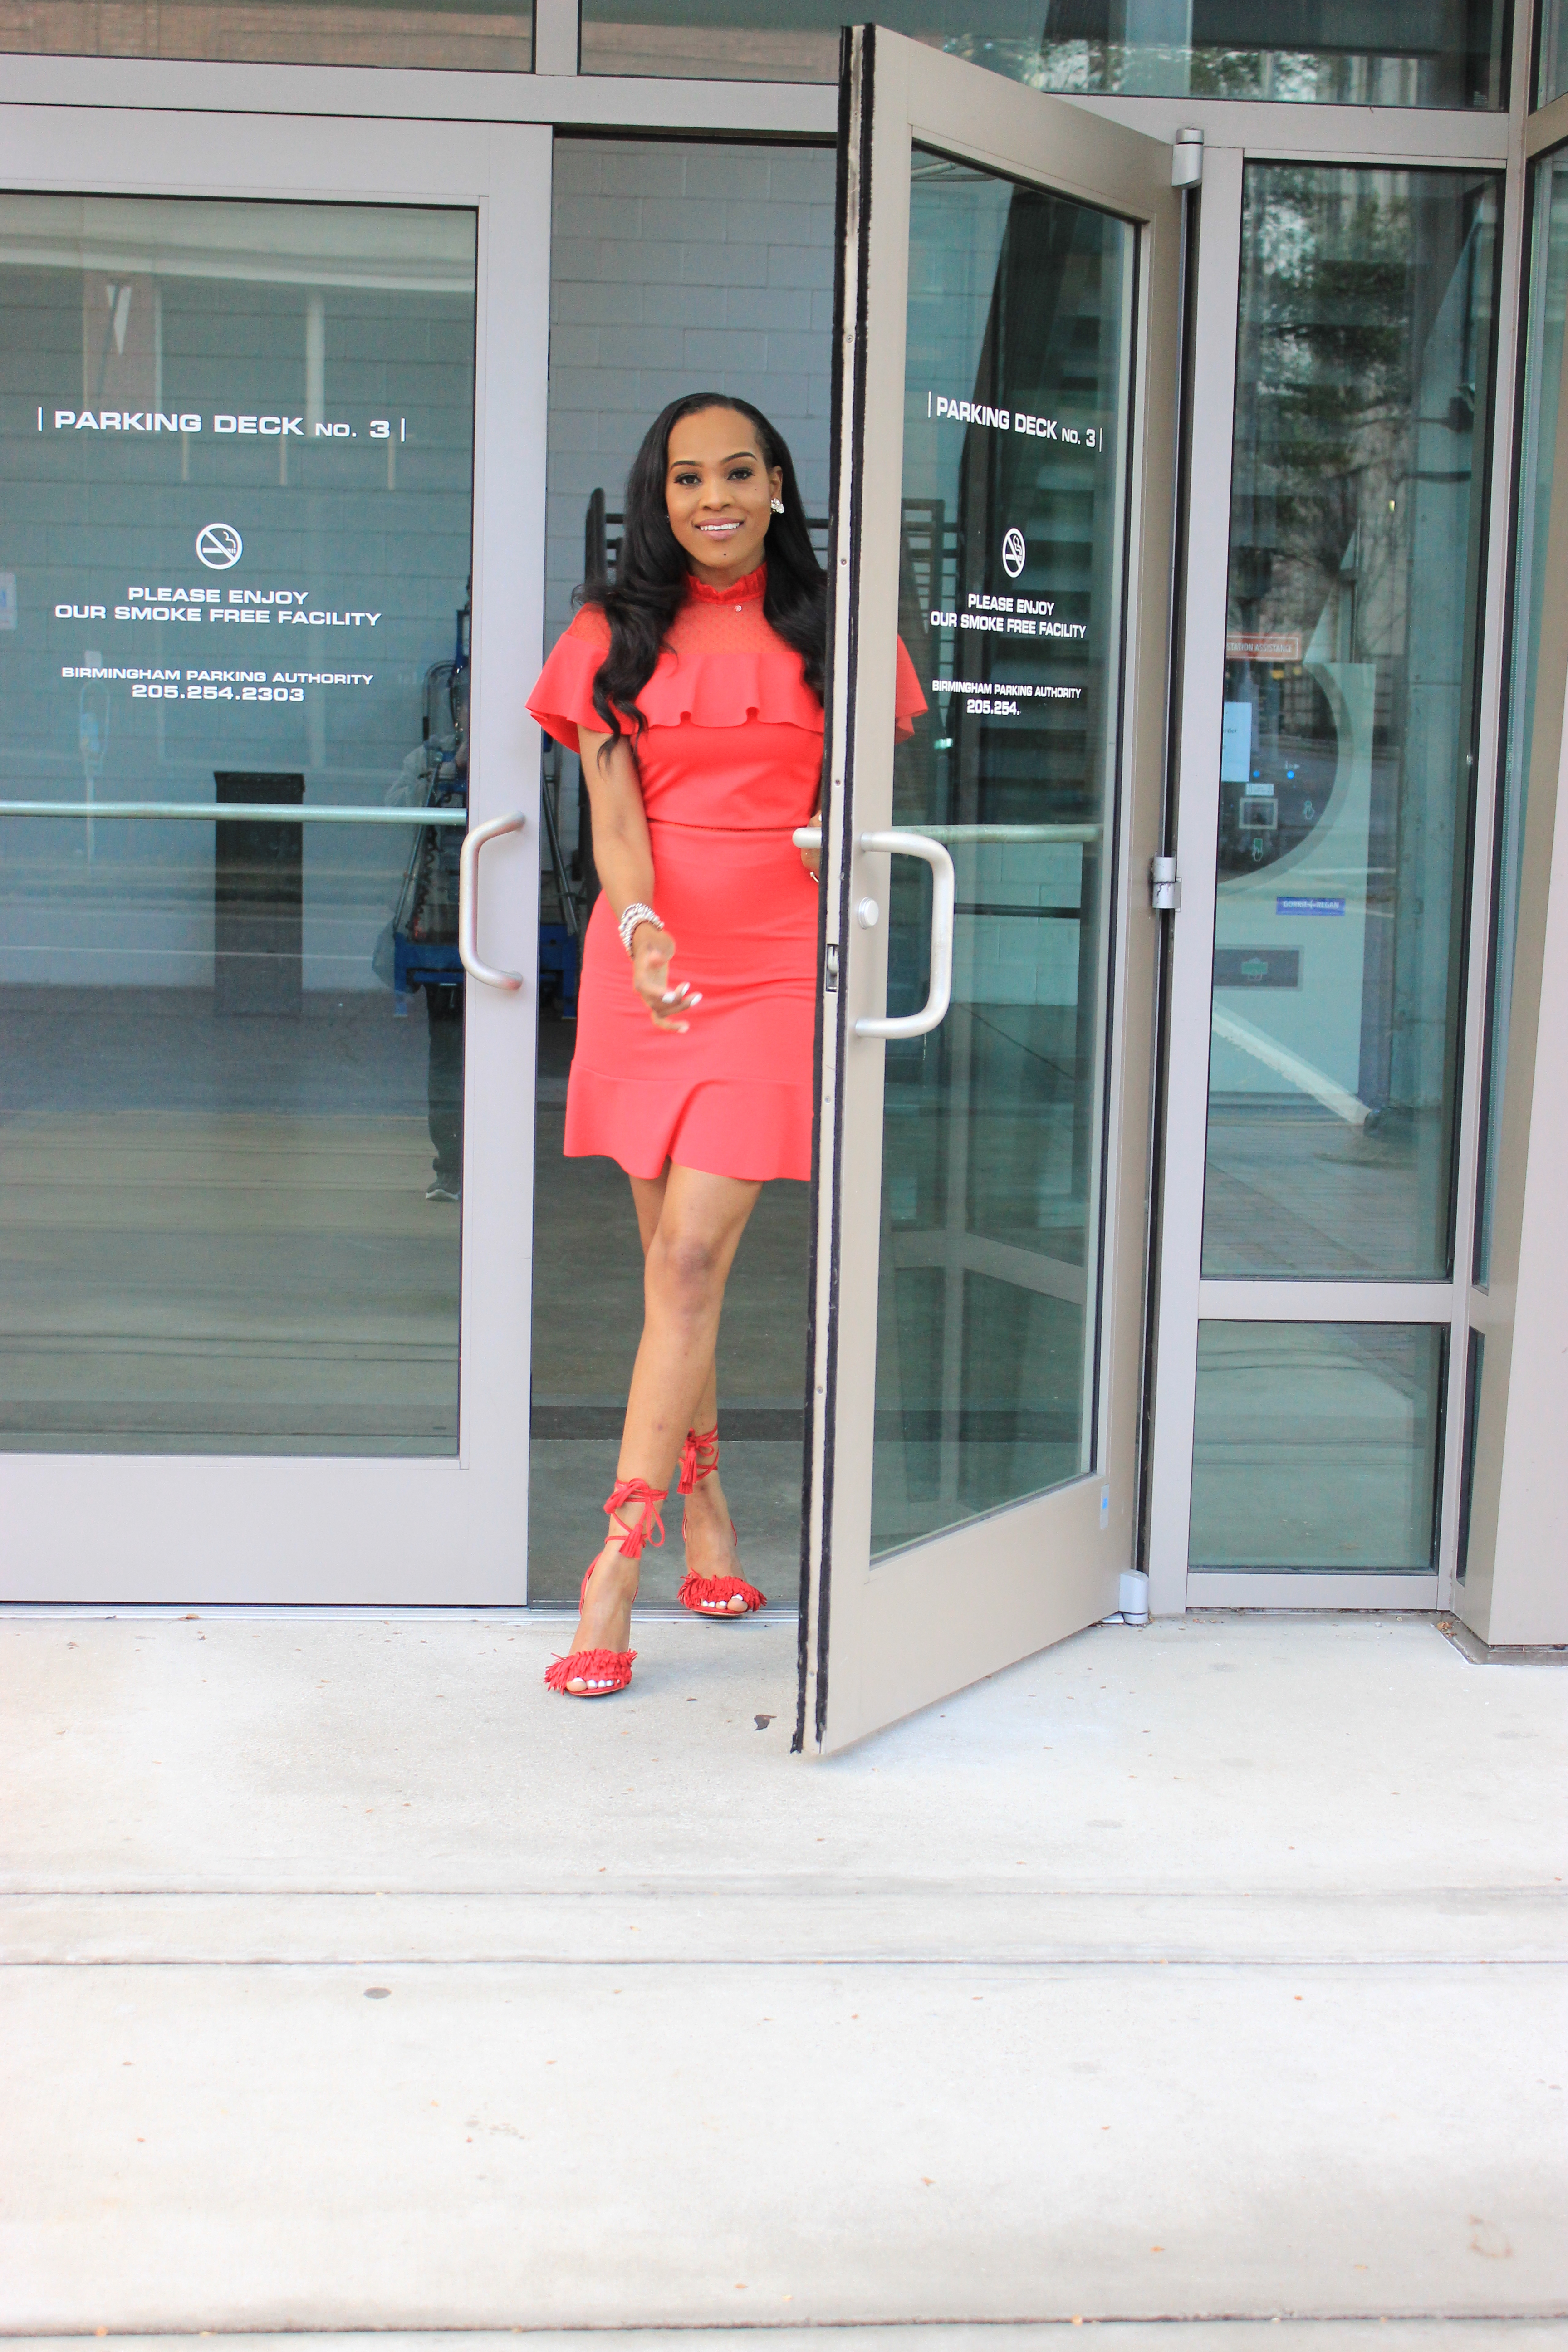 Style-files-Asos-Skater-Dress-with-Dobby-mesh-panel-red-skater-dress-asos-red-skater-dress-red-fringe-justfab-heels-justfab-red-tayrey-heel-sandals-oohlalablog-3